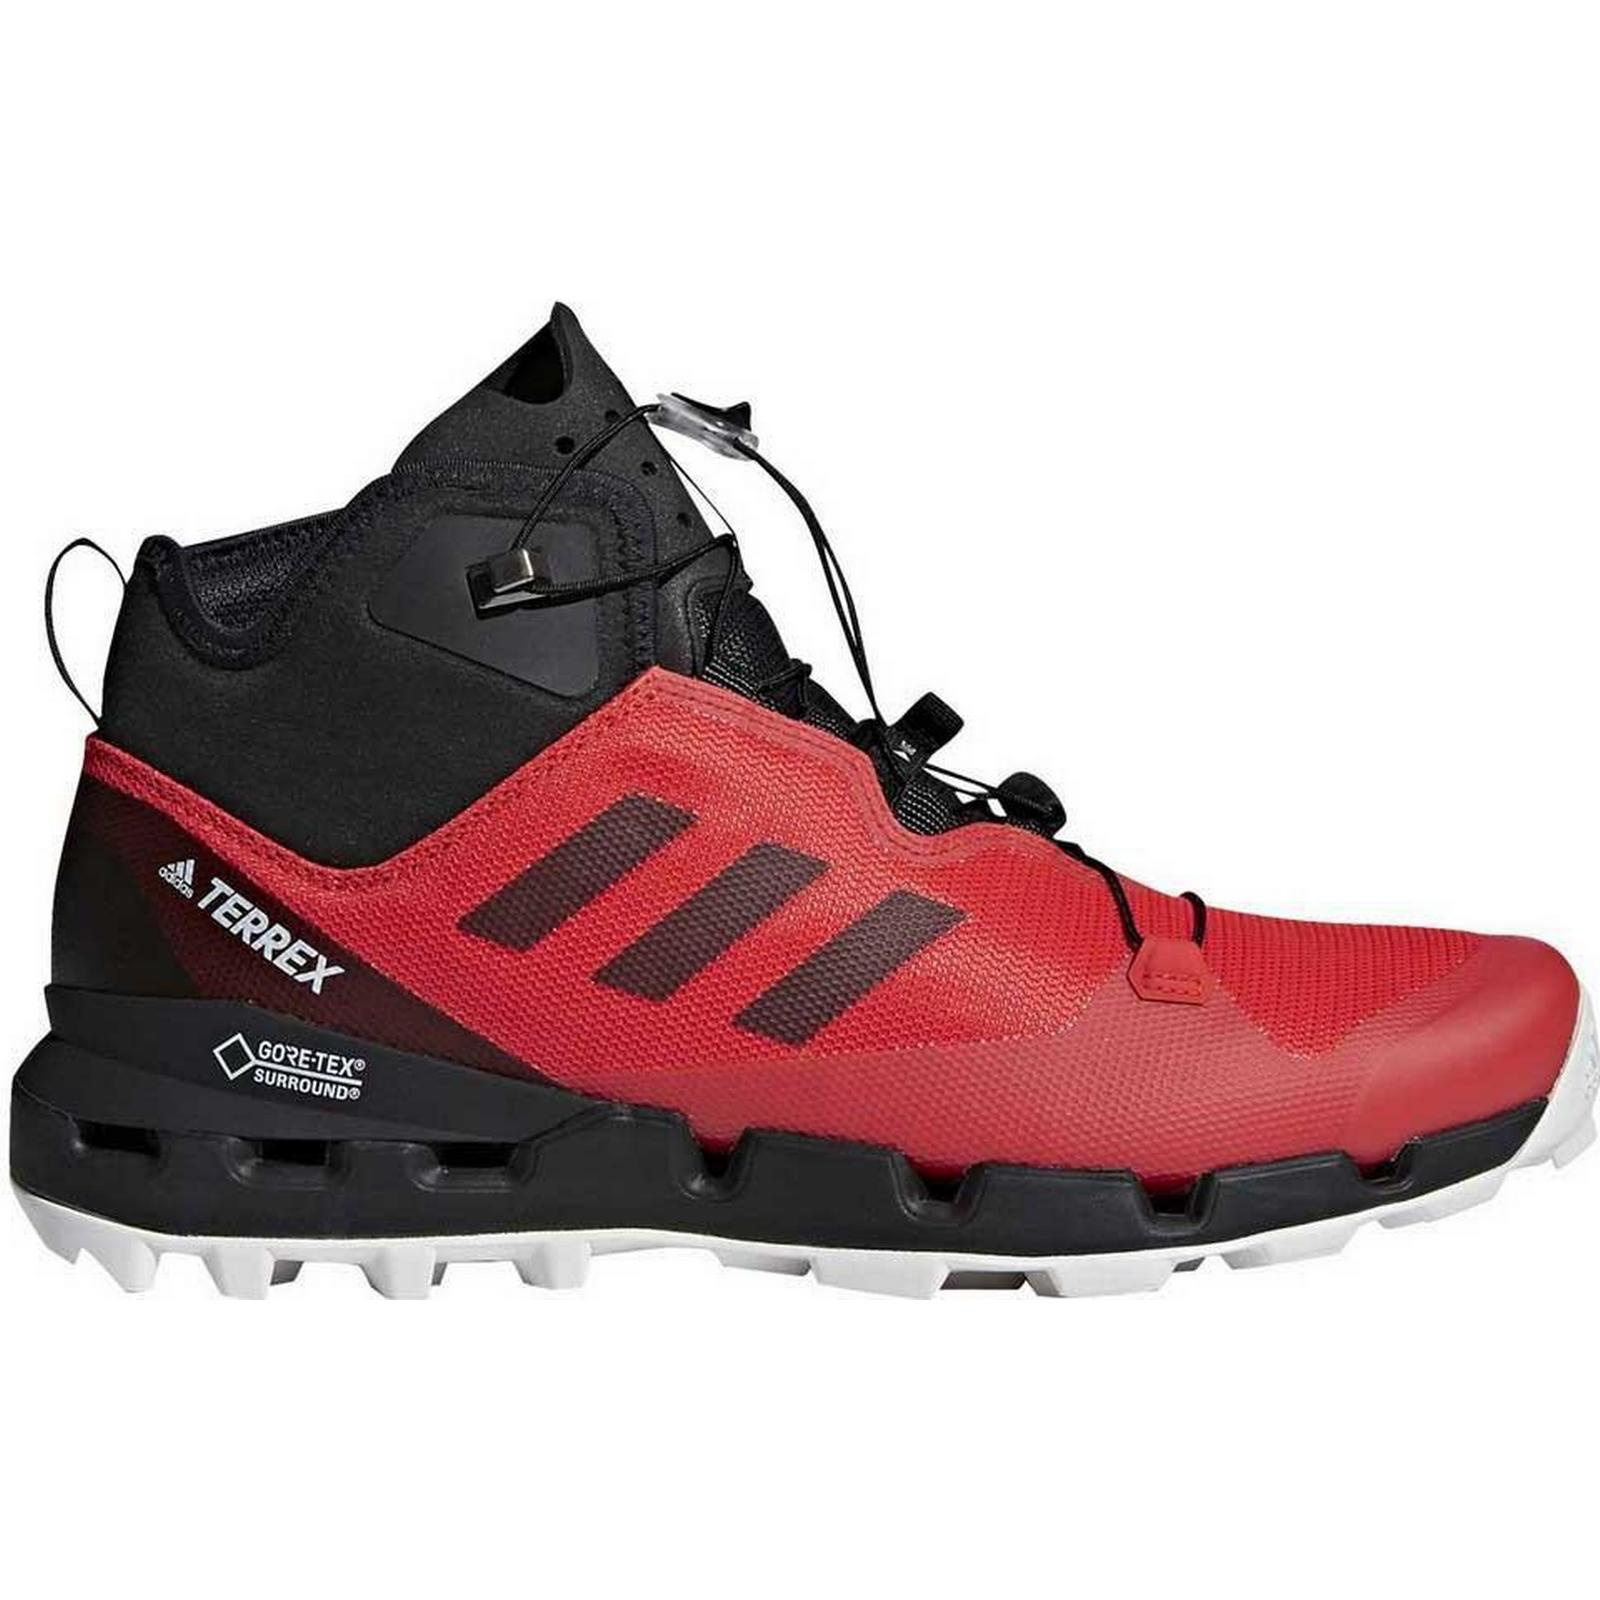 Adidas Terrex Fast Mid Goretex Surround Surround Goretex 5f2f60